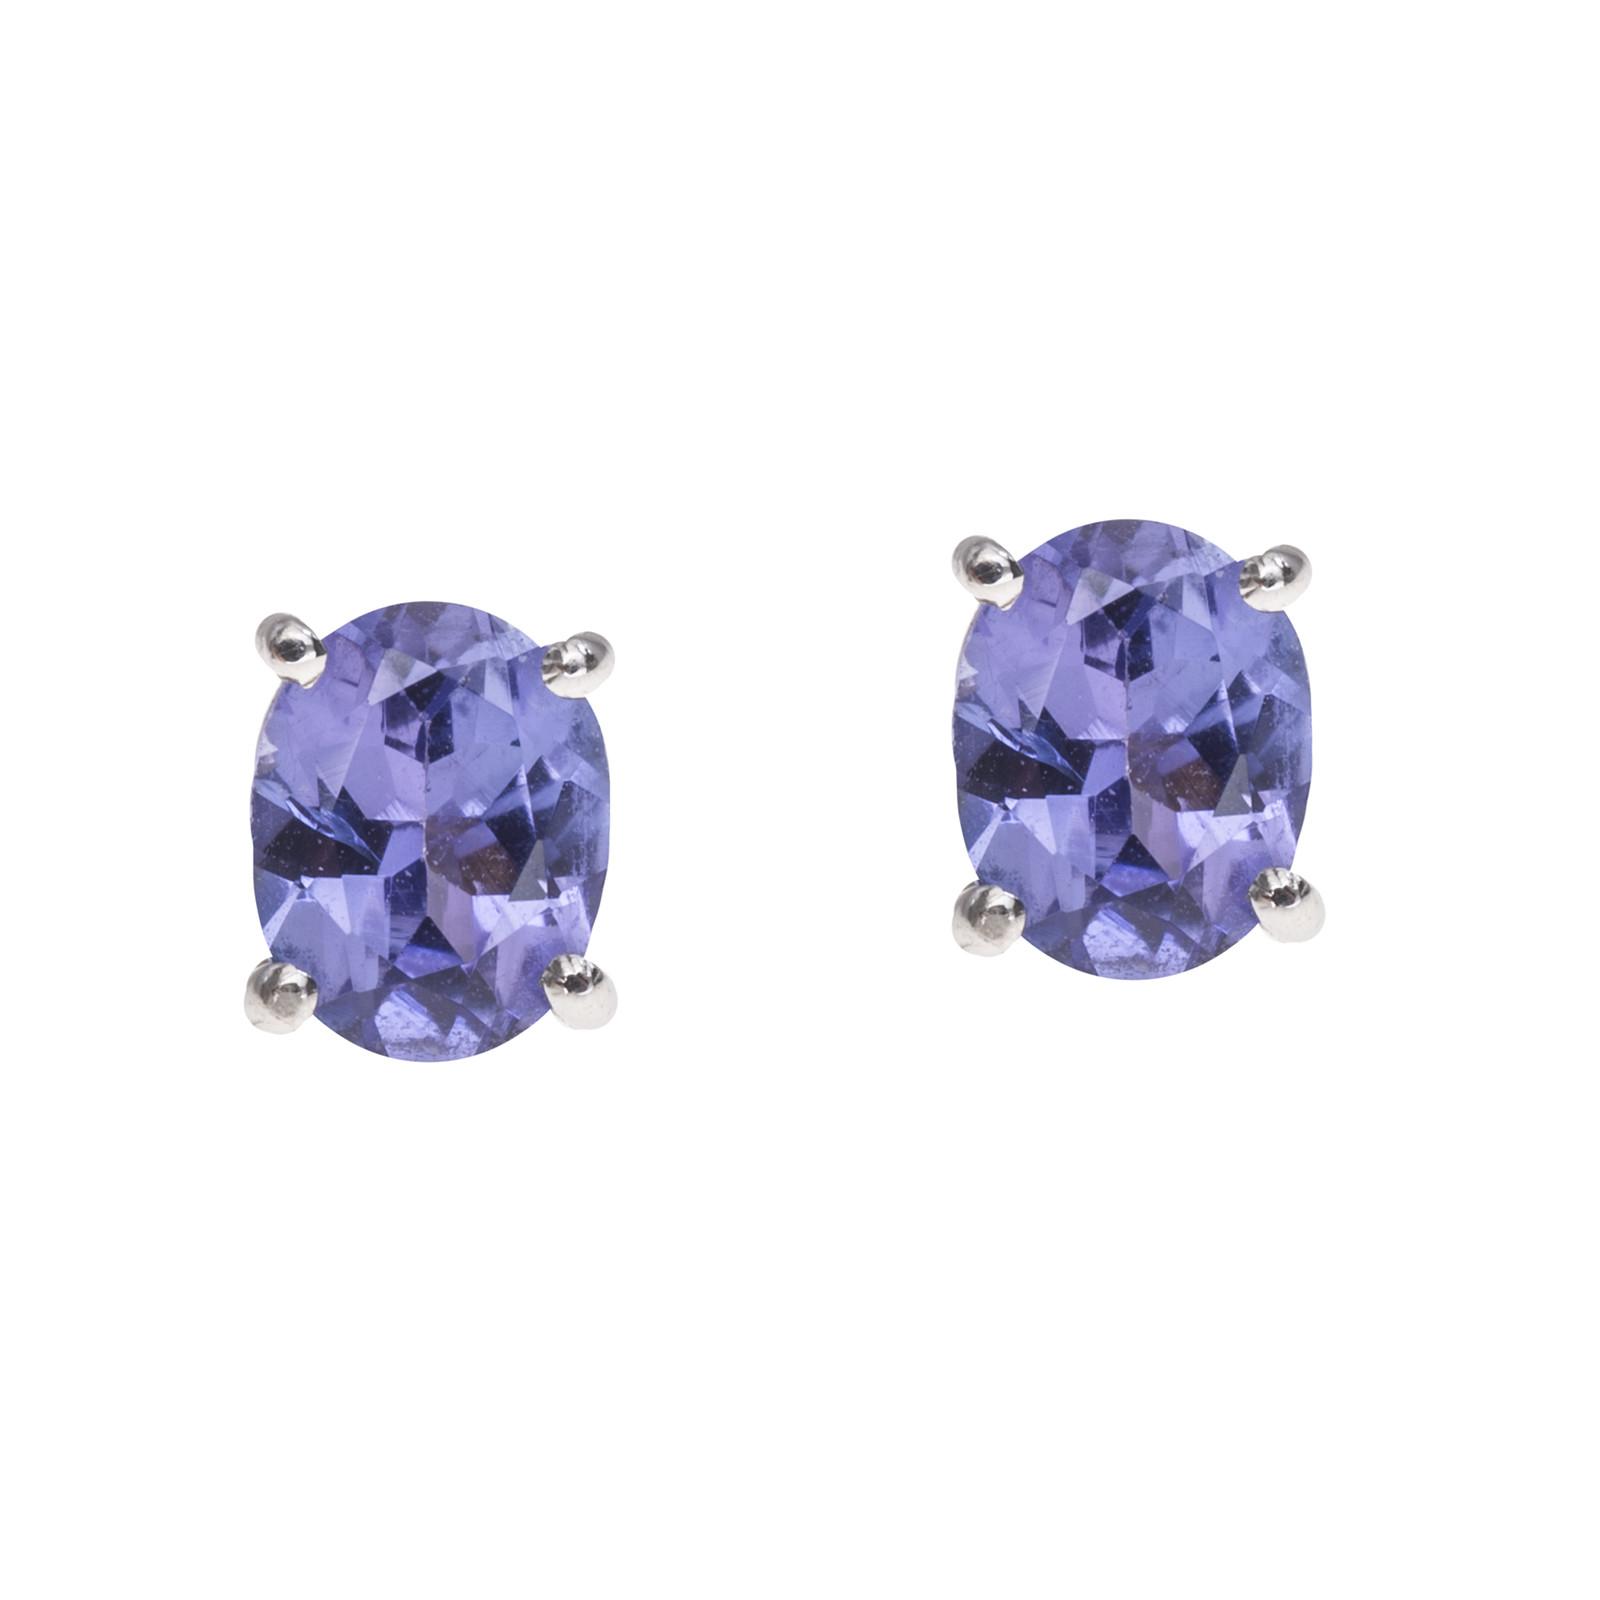 New 0.67 CTW Tanzanite Stud Earrings